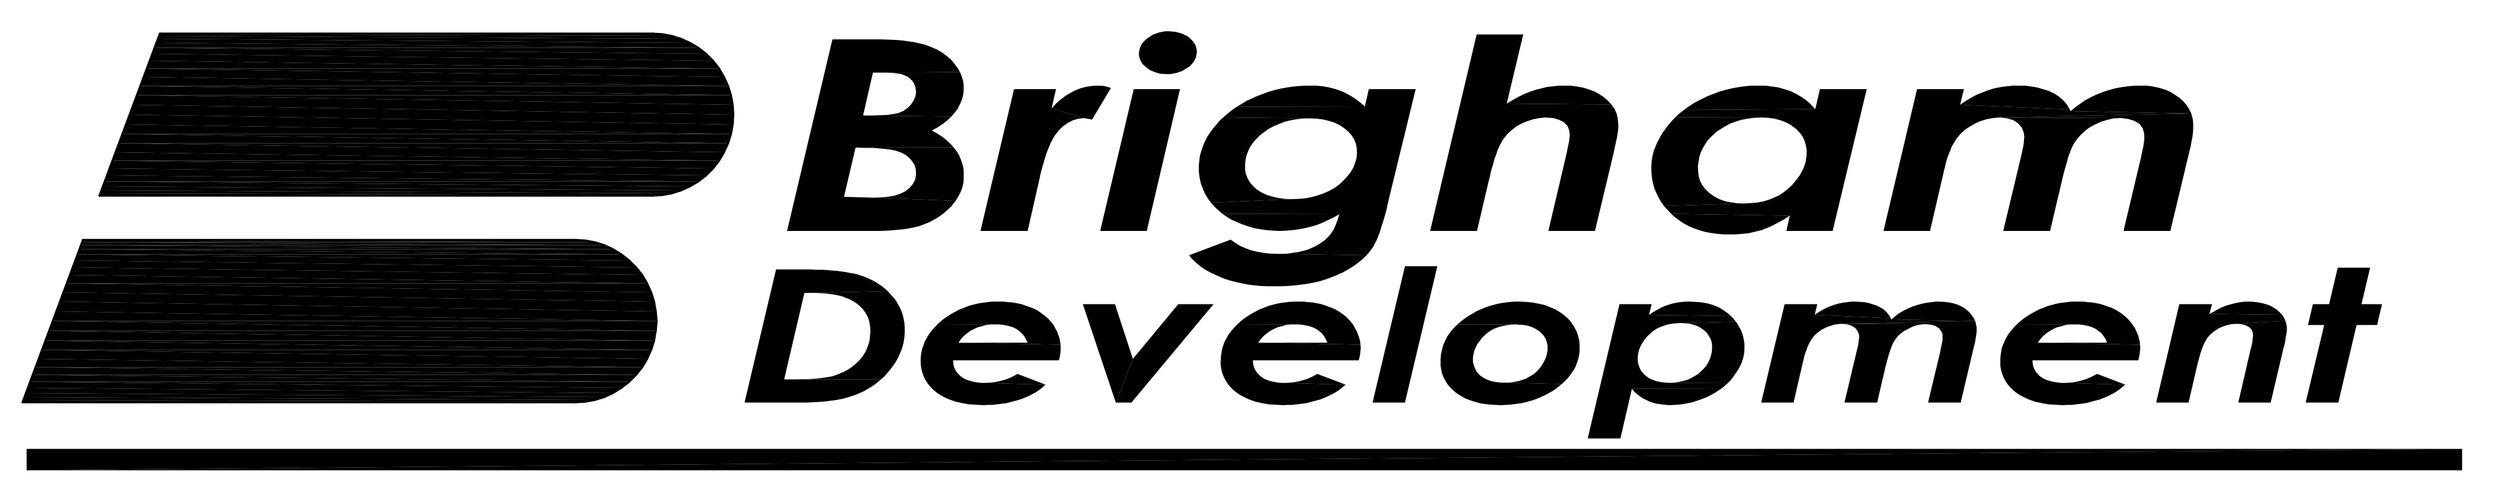 Brigham Development Logo